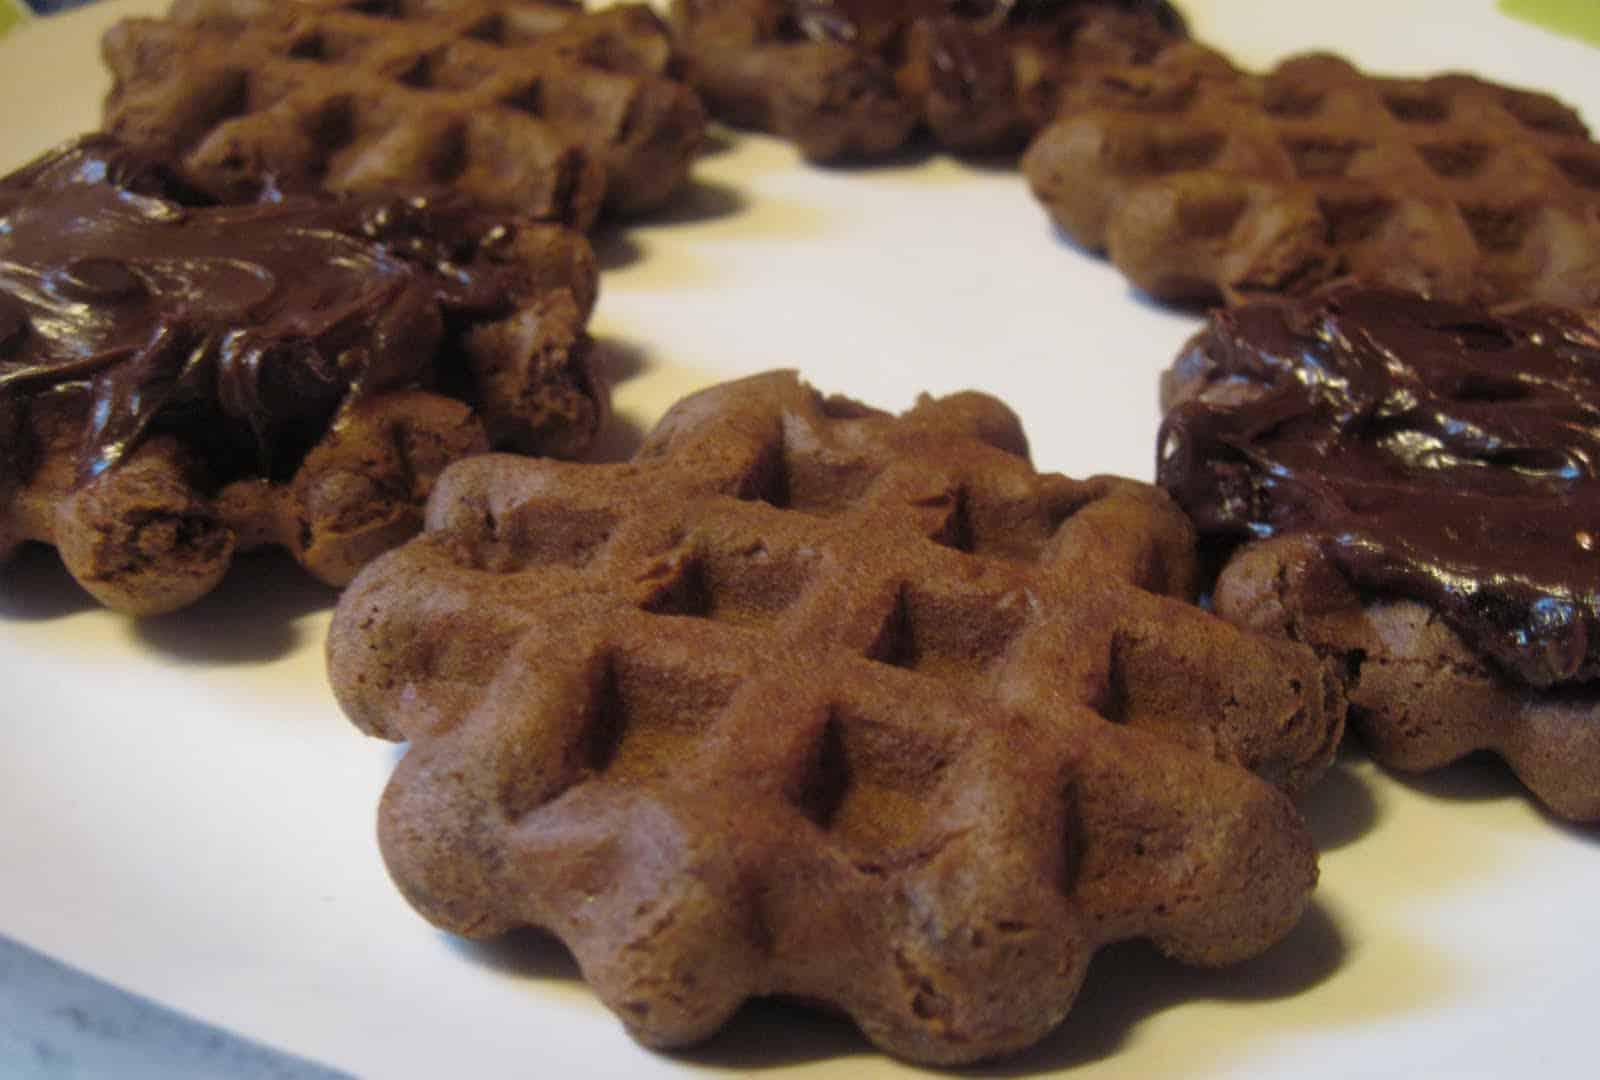 Waffle iron chocolate cookies